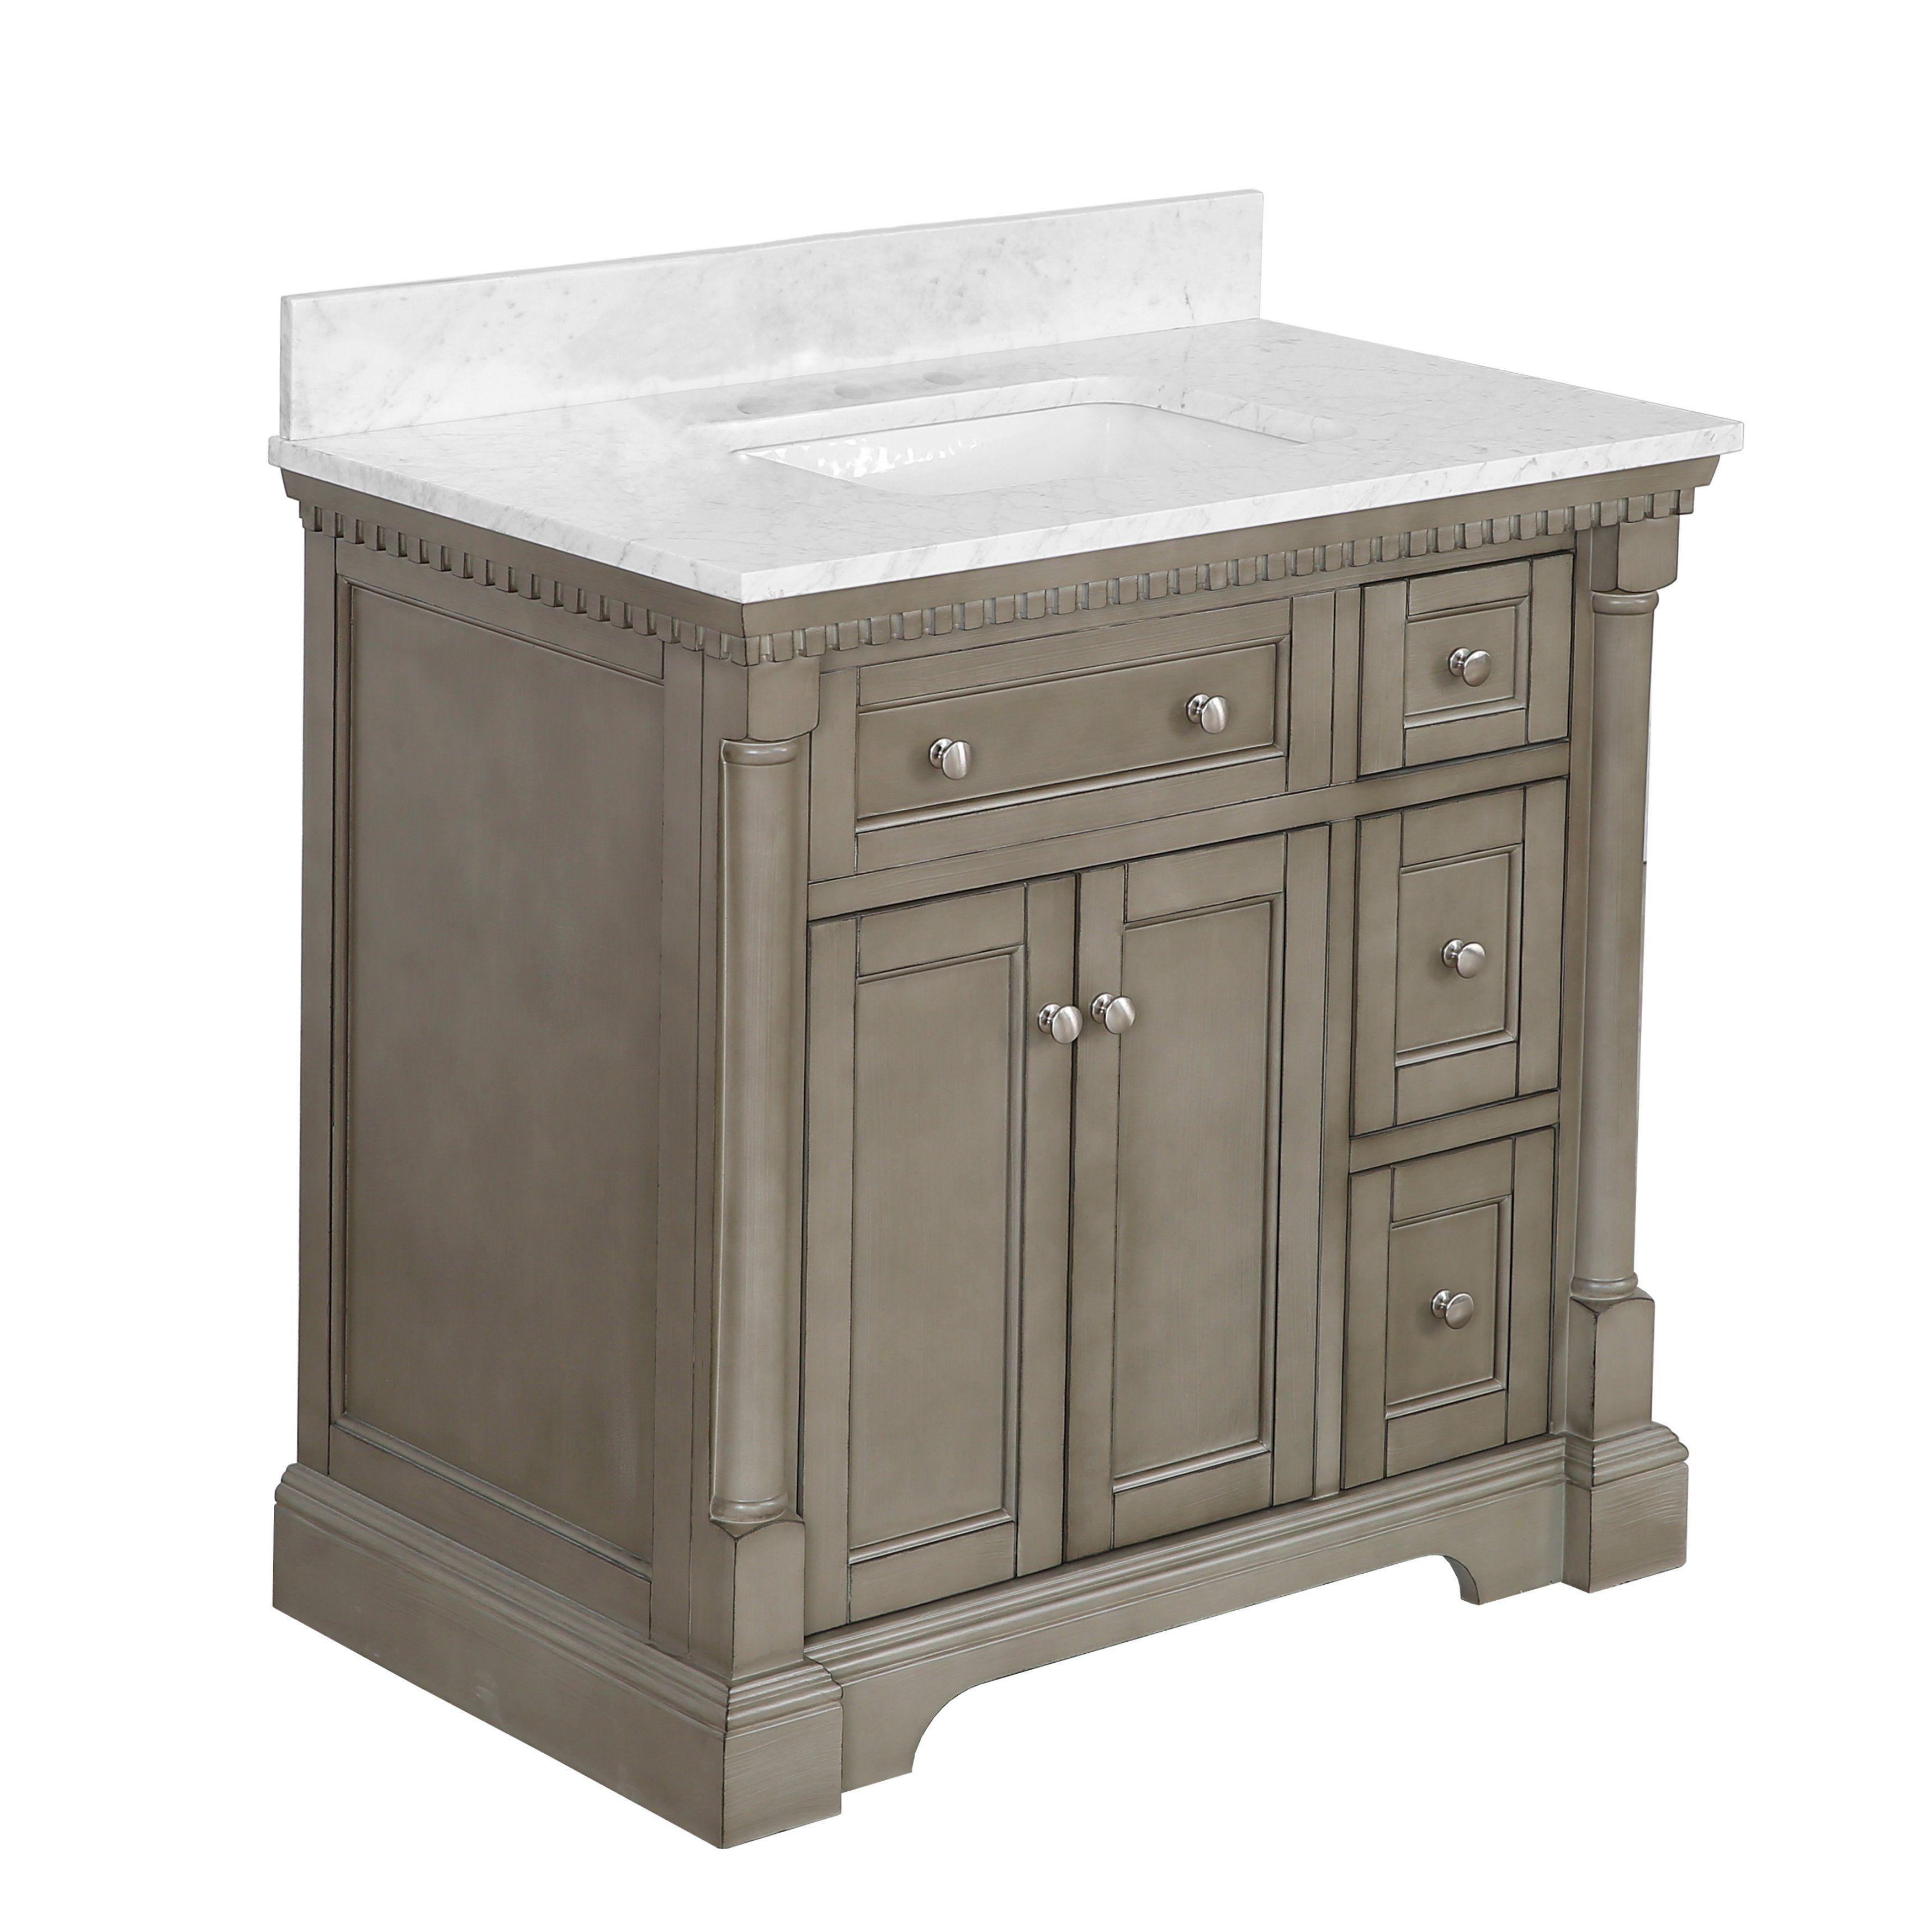 Sydney 36 Inch Vanity With Carrara Marble Top In 2021 36 Inch Vanity 36 Inch Bathroom Vanity Bathroom Vanity